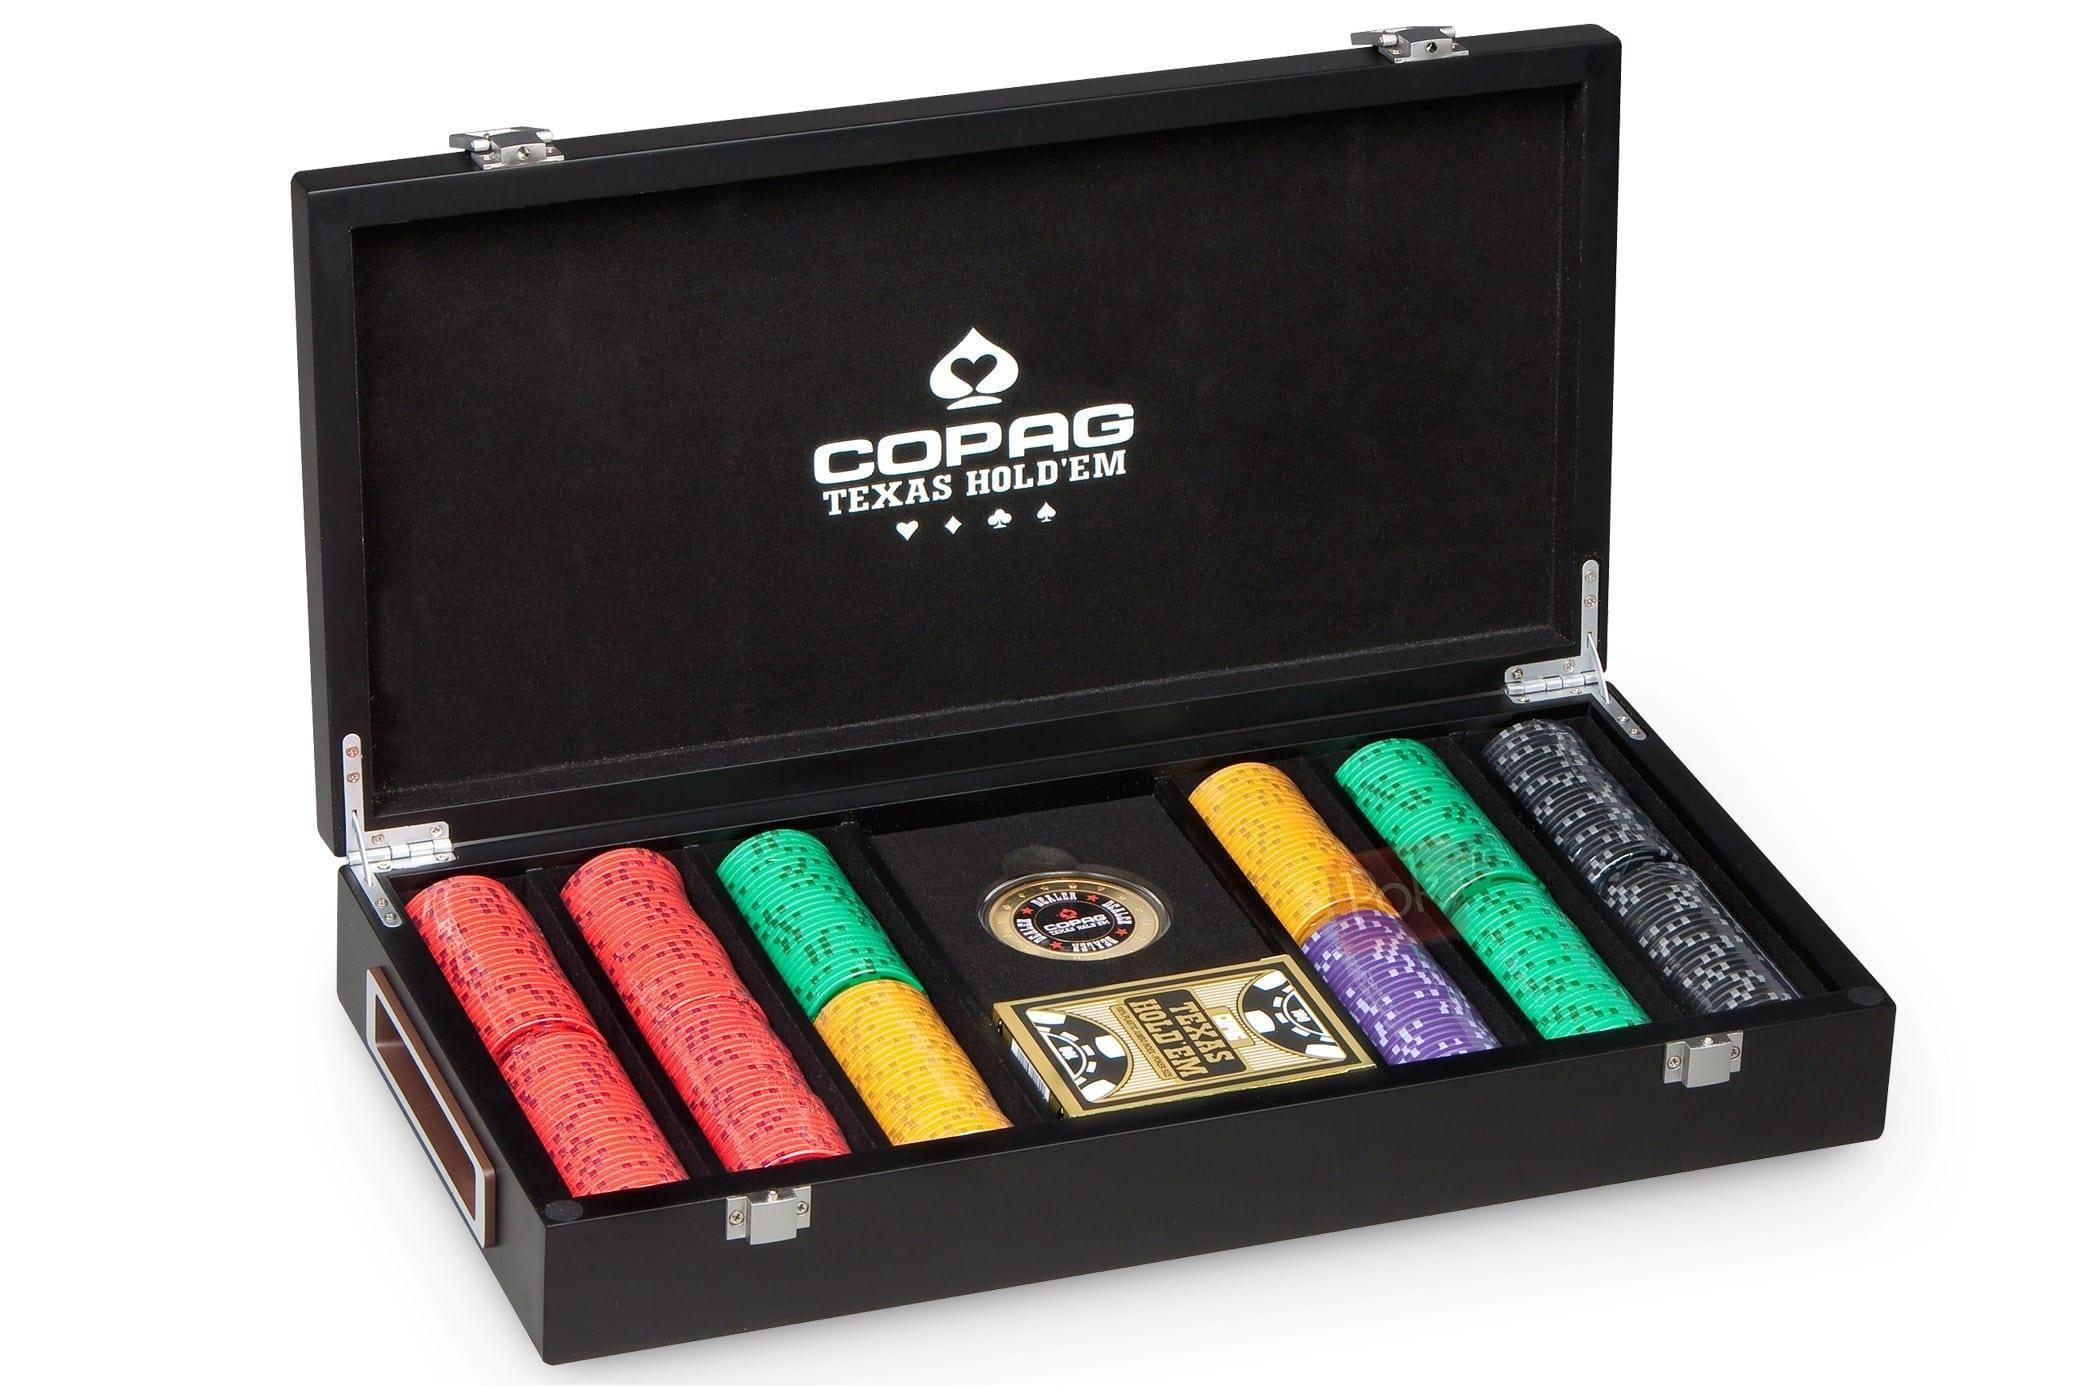 Coffret Copag 300 jetons de Poker